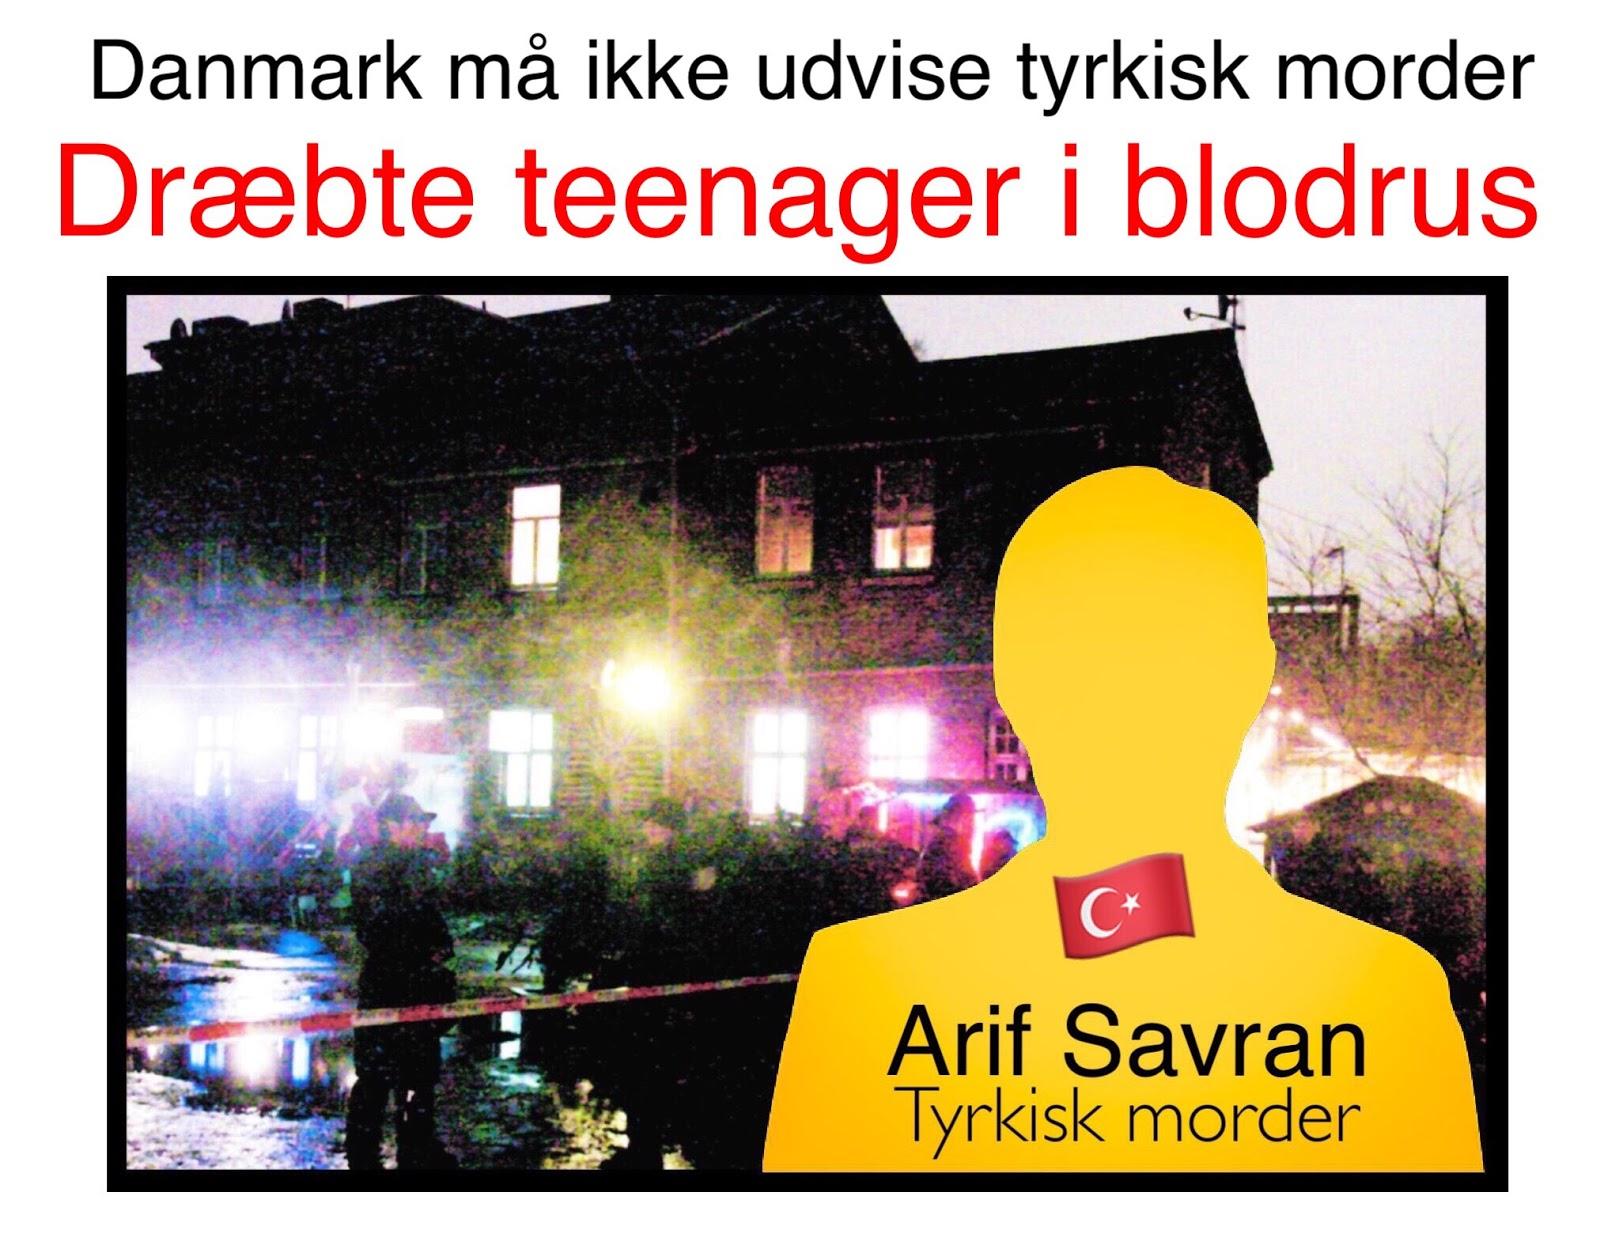 Danmark Ma Ikke Udvise Morder Til Tyrkiet Han Kvaste Teenagers